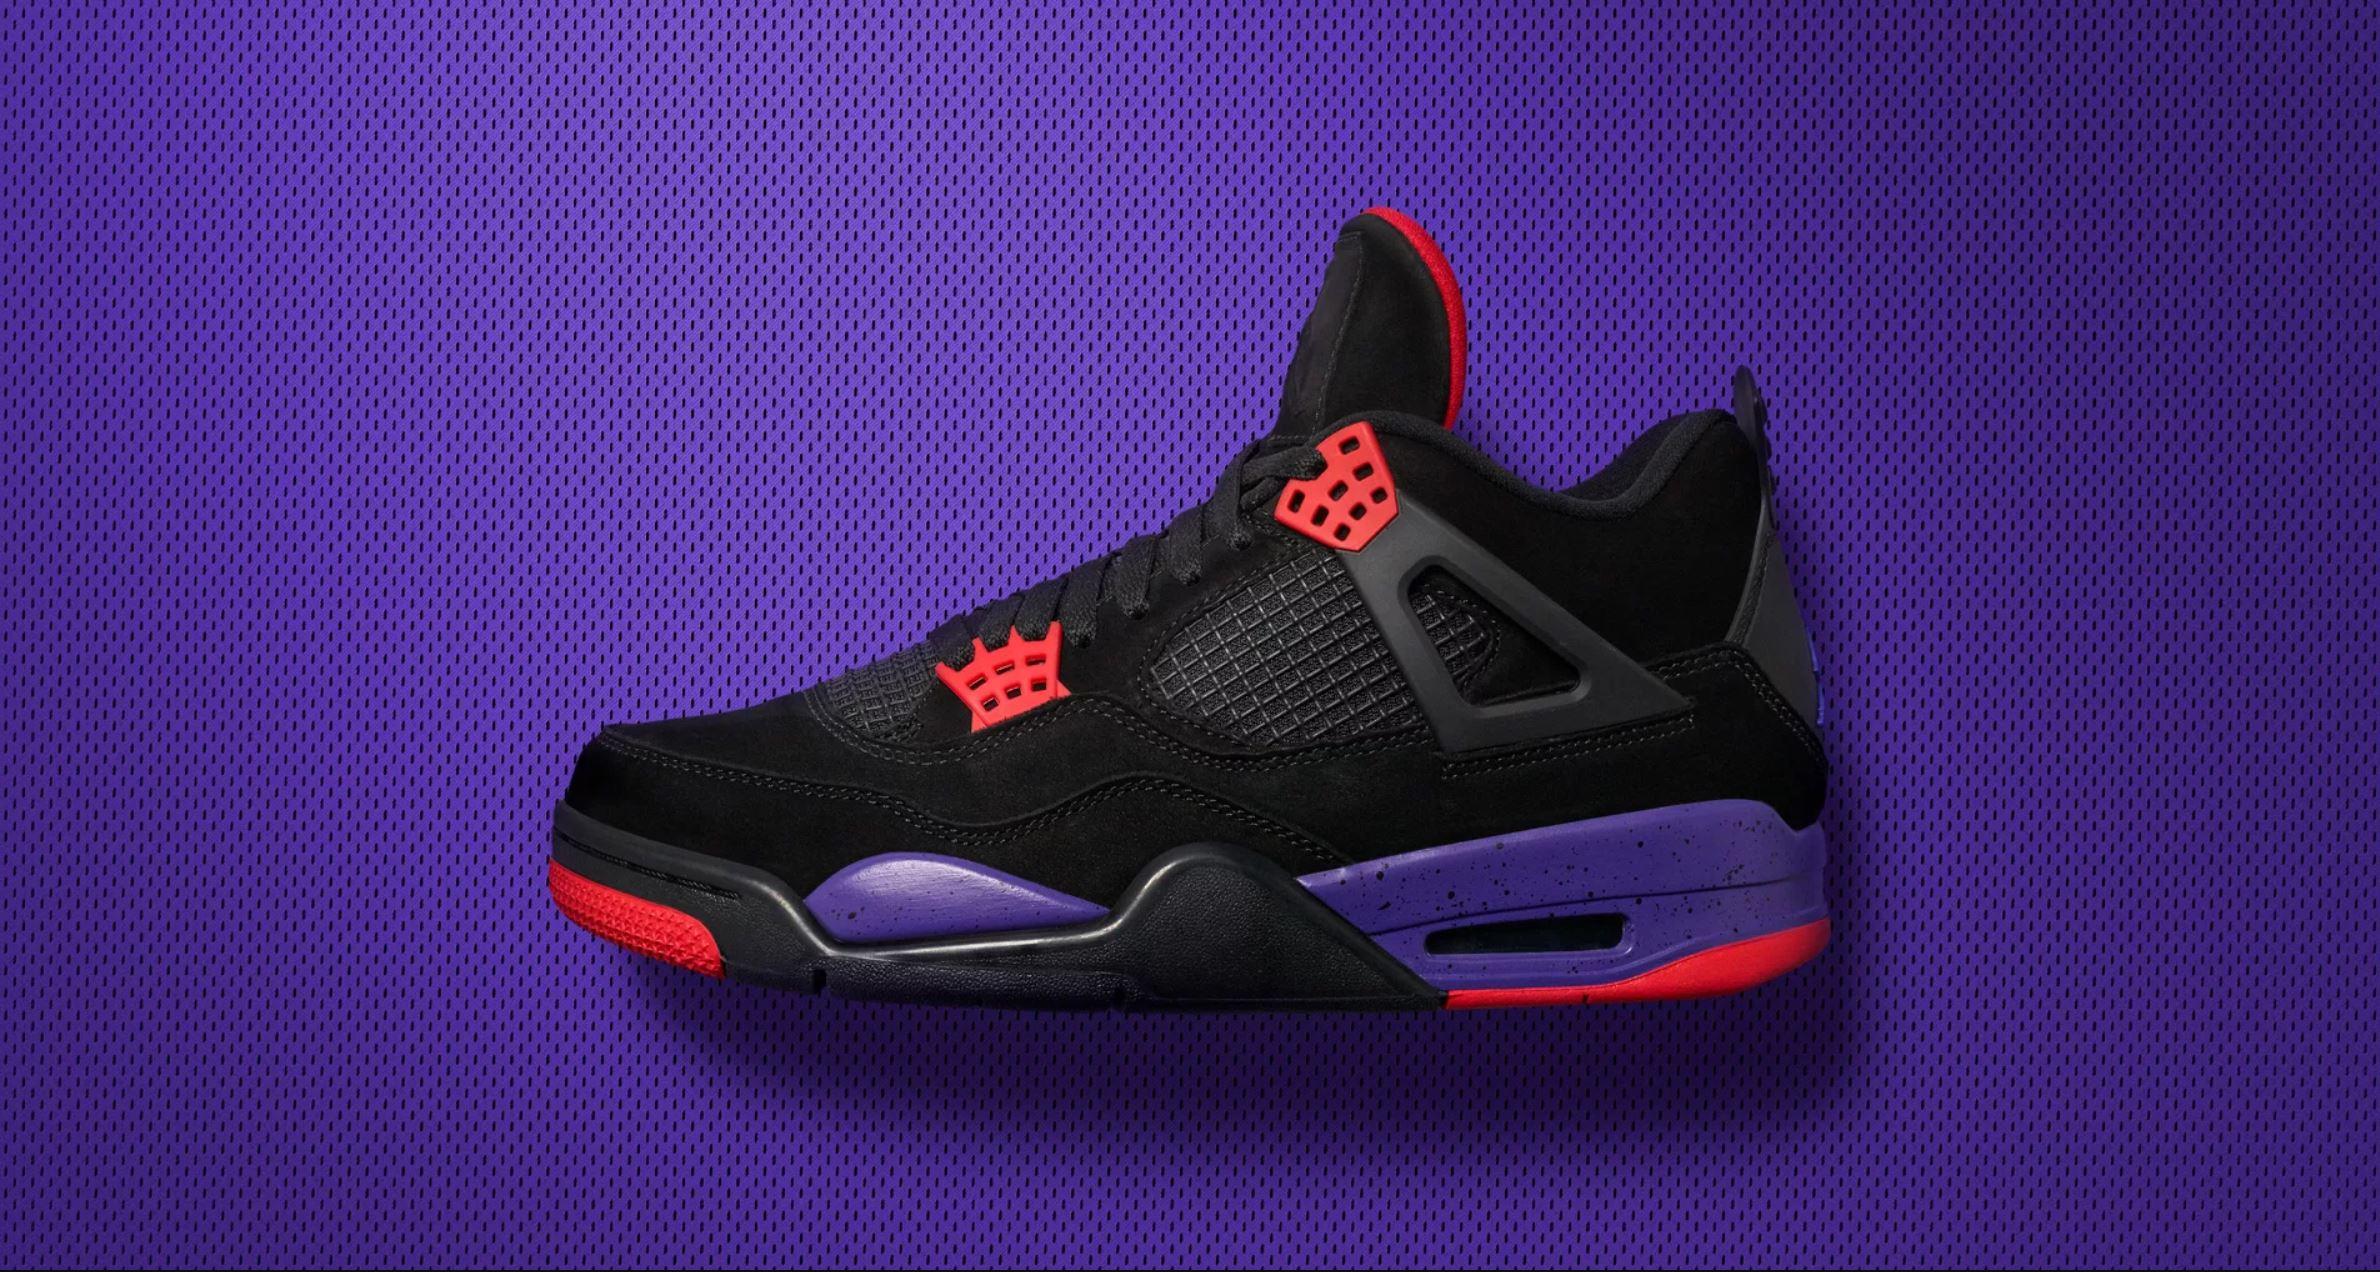 4b351cd6d31 Jordan Brand / Kicks On Court ...